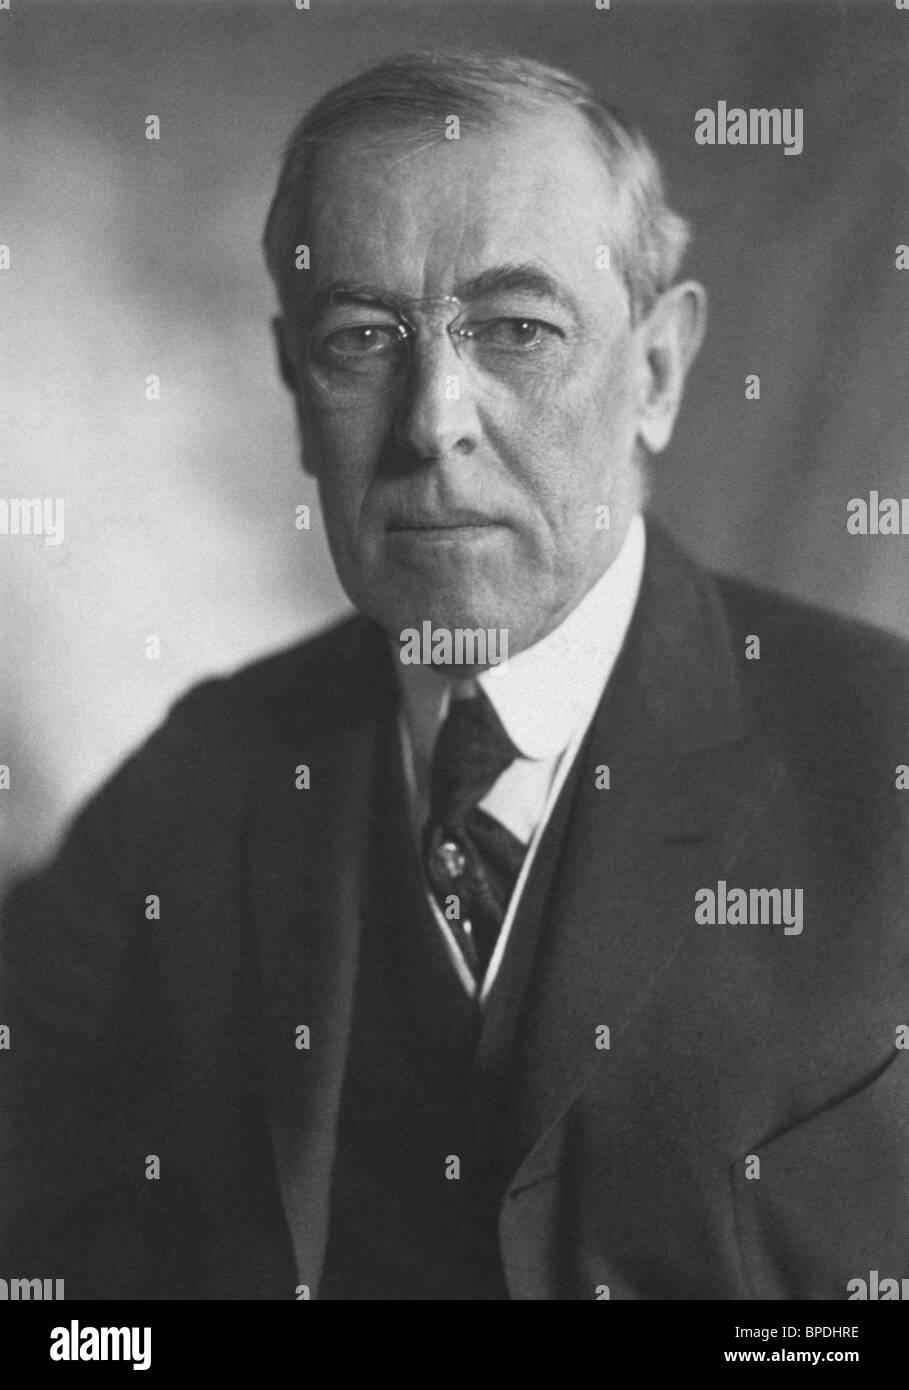 Portrait photo circa 1919 of Woodrow Wilson (1856 - 1924) - the 28th US President (1913 - 1921). - Stock Image